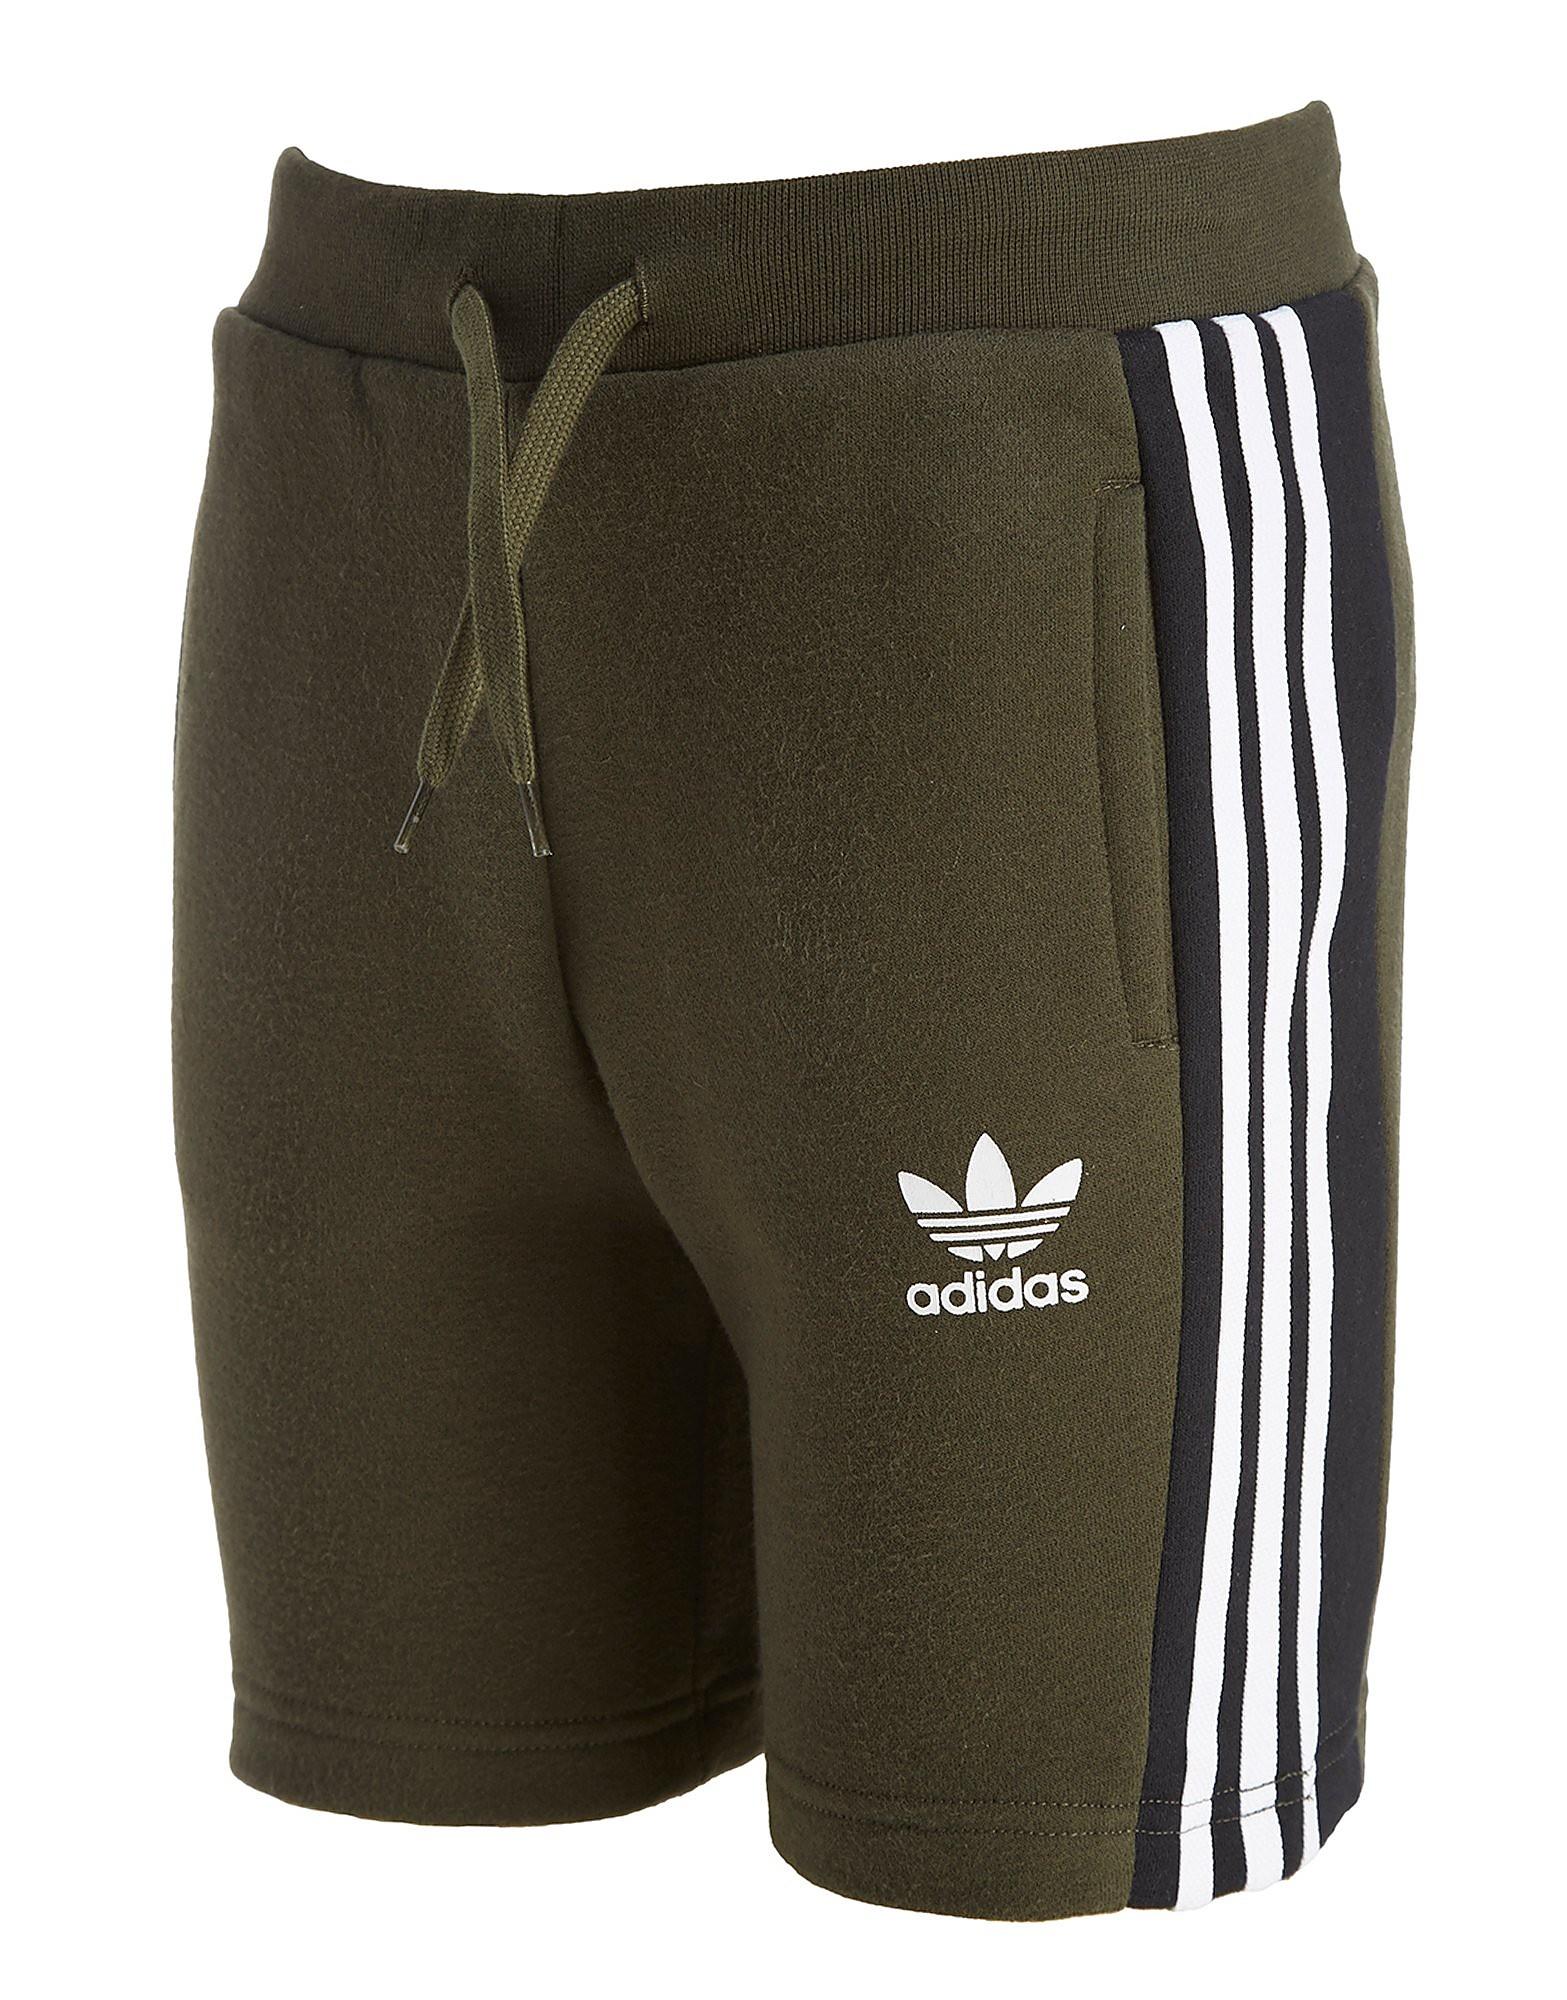 adidas Originals Short 3-Stripes Trefoil Junior